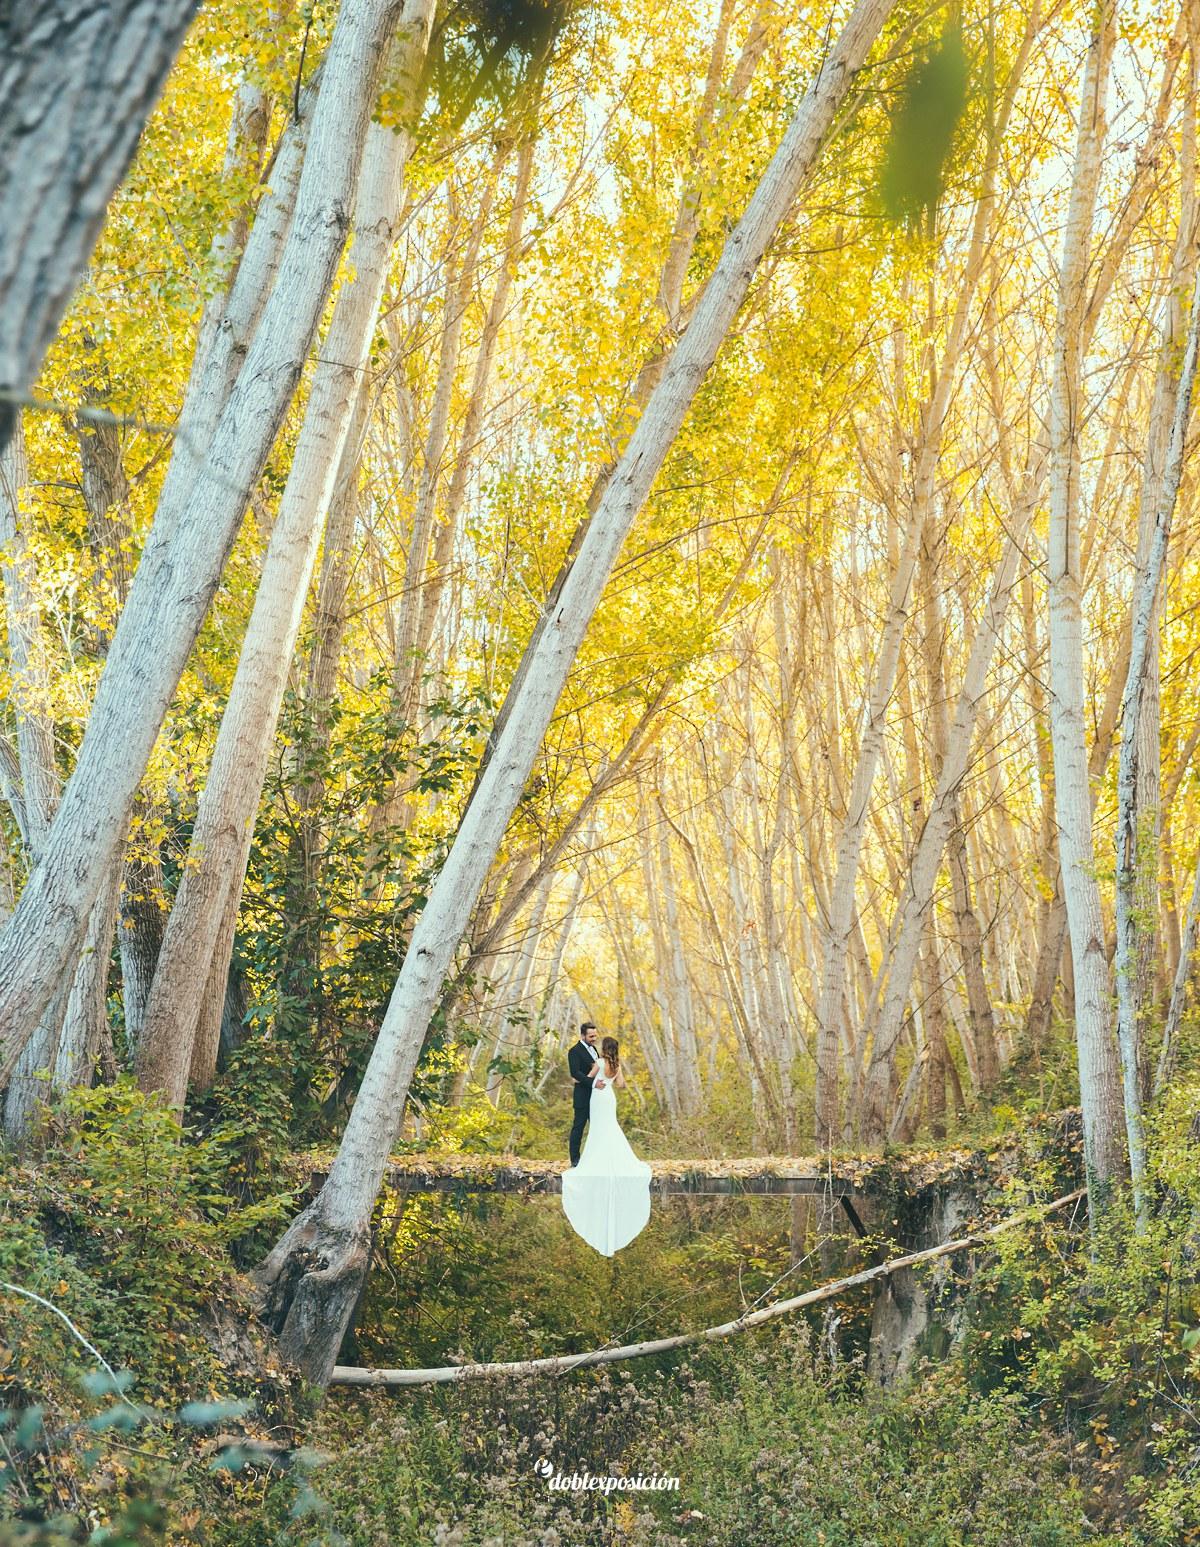 fotografos-boda-elche-alicante-reportaje-bosque-postboda-008